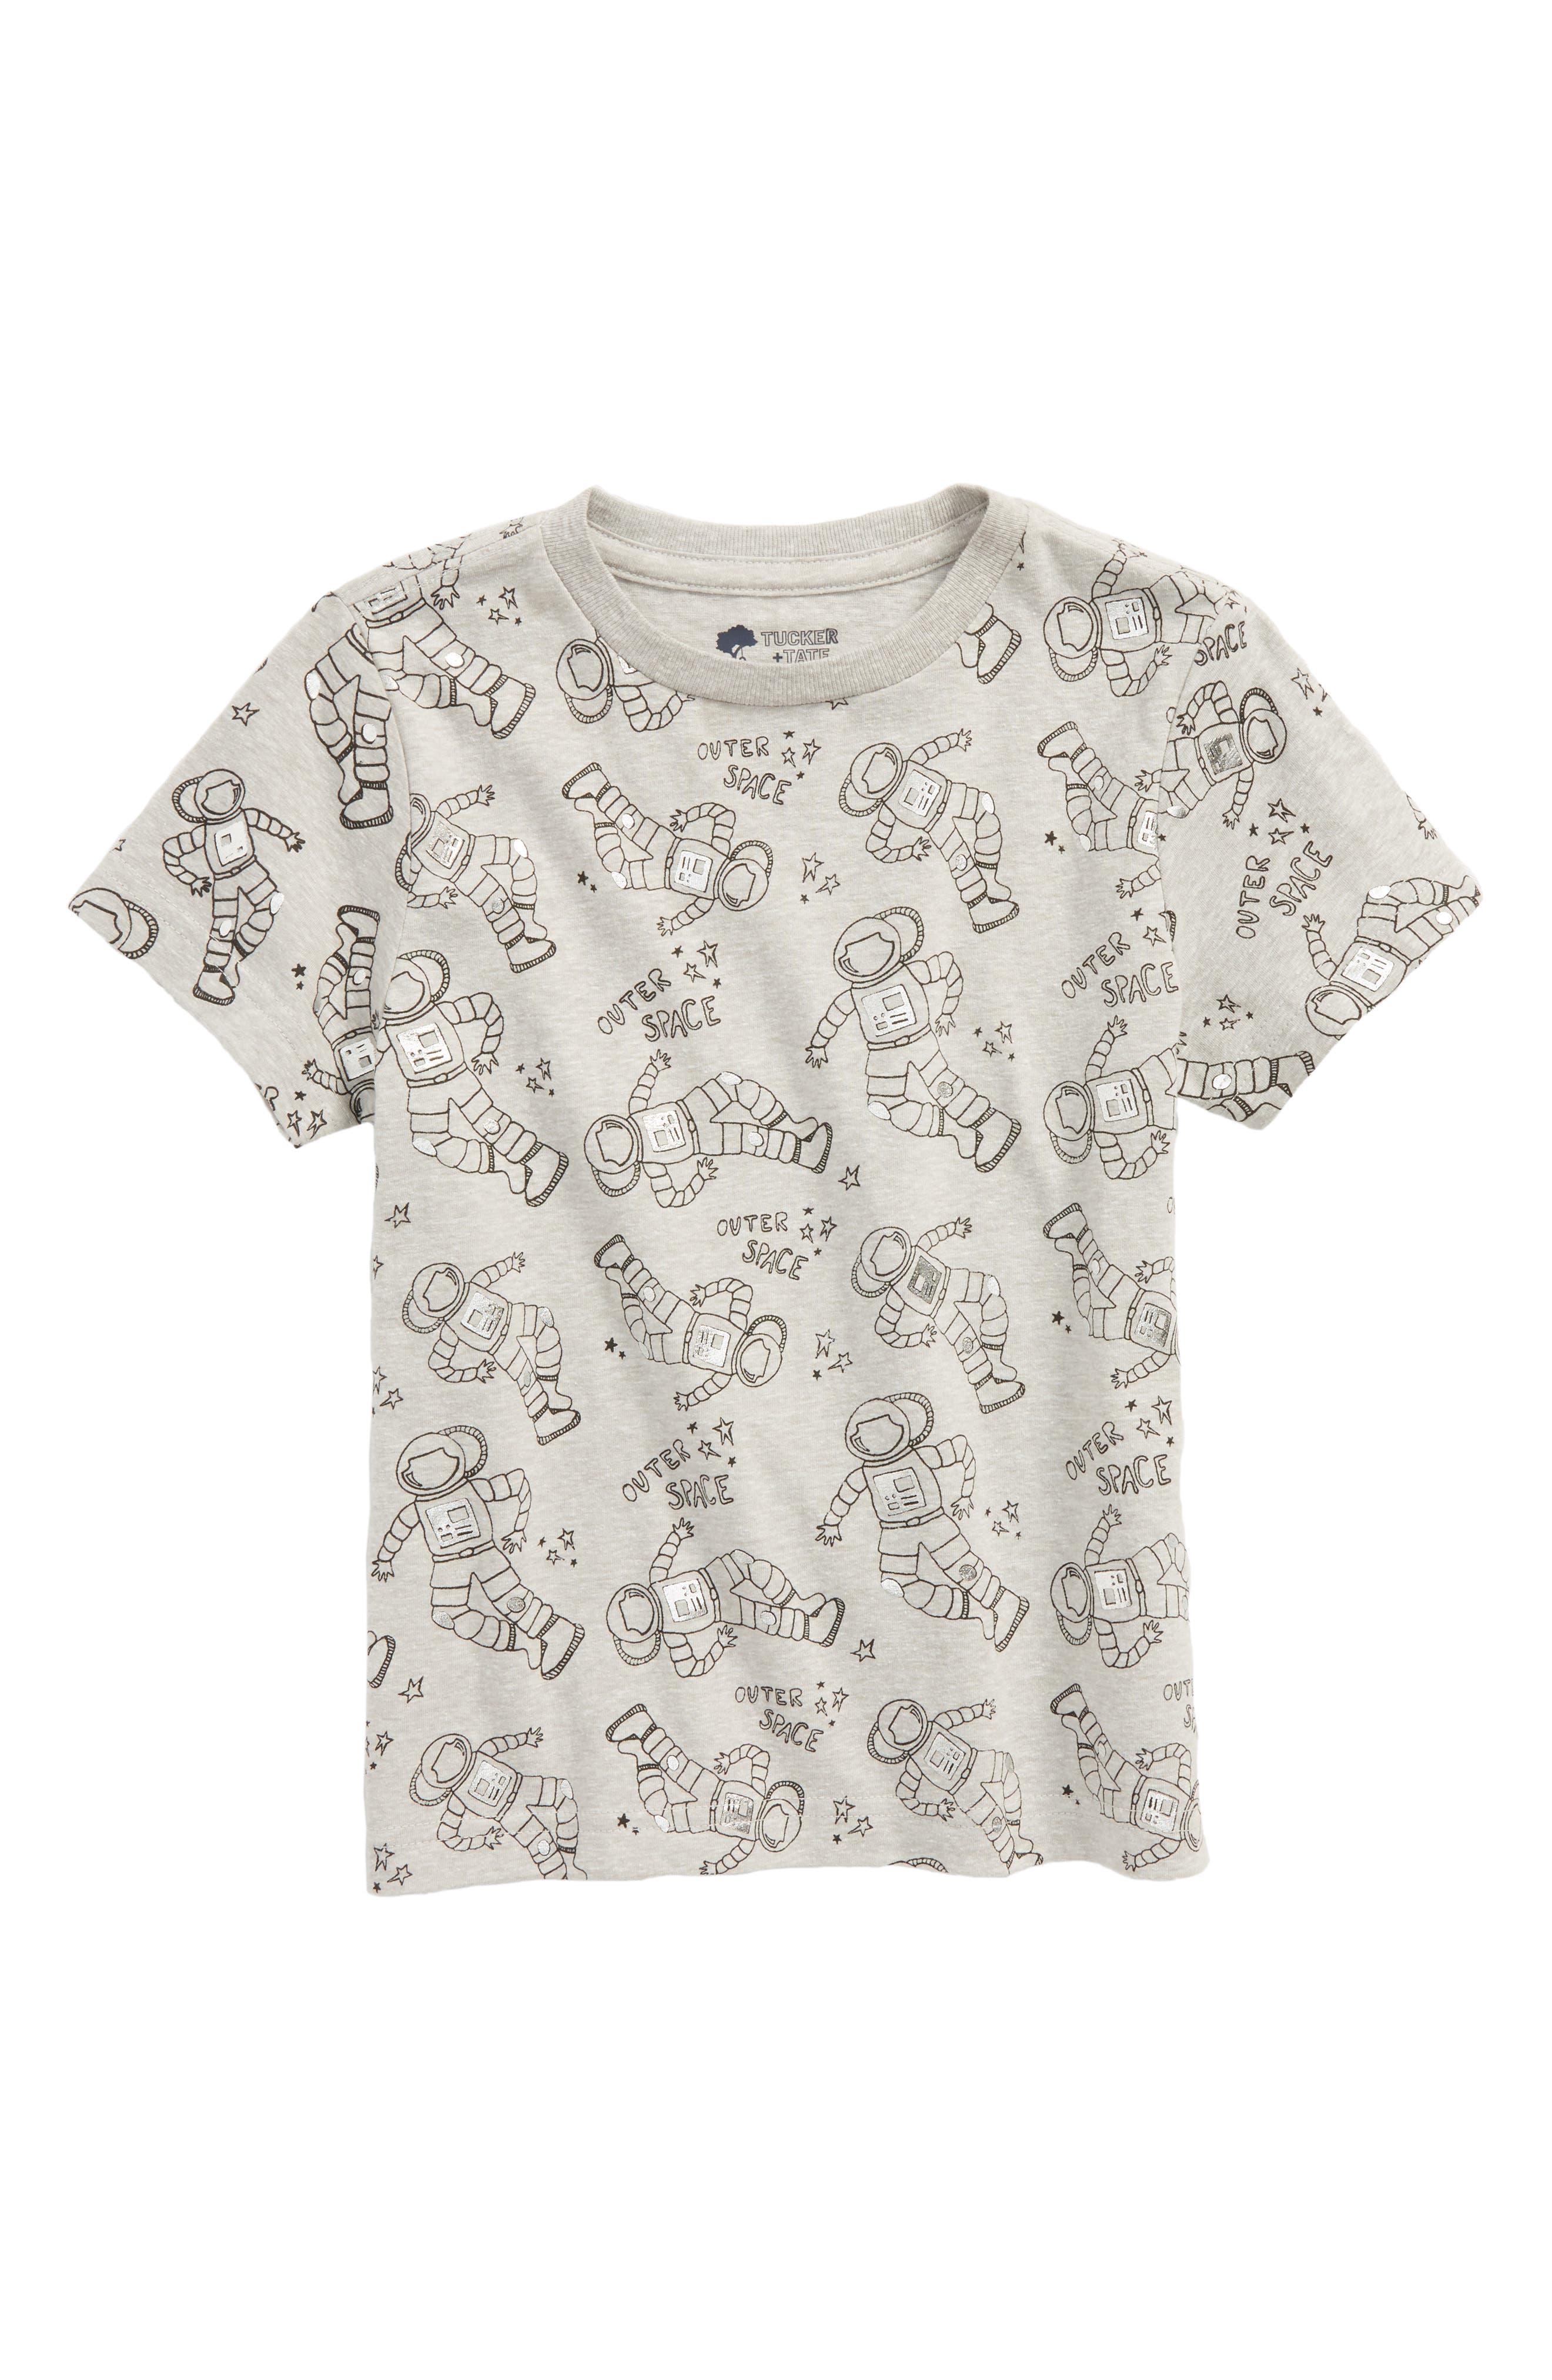 Print Foil T-Shirt,                             Main thumbnail 1, color,                             GREY ASH HEATHER ASTRONAUT